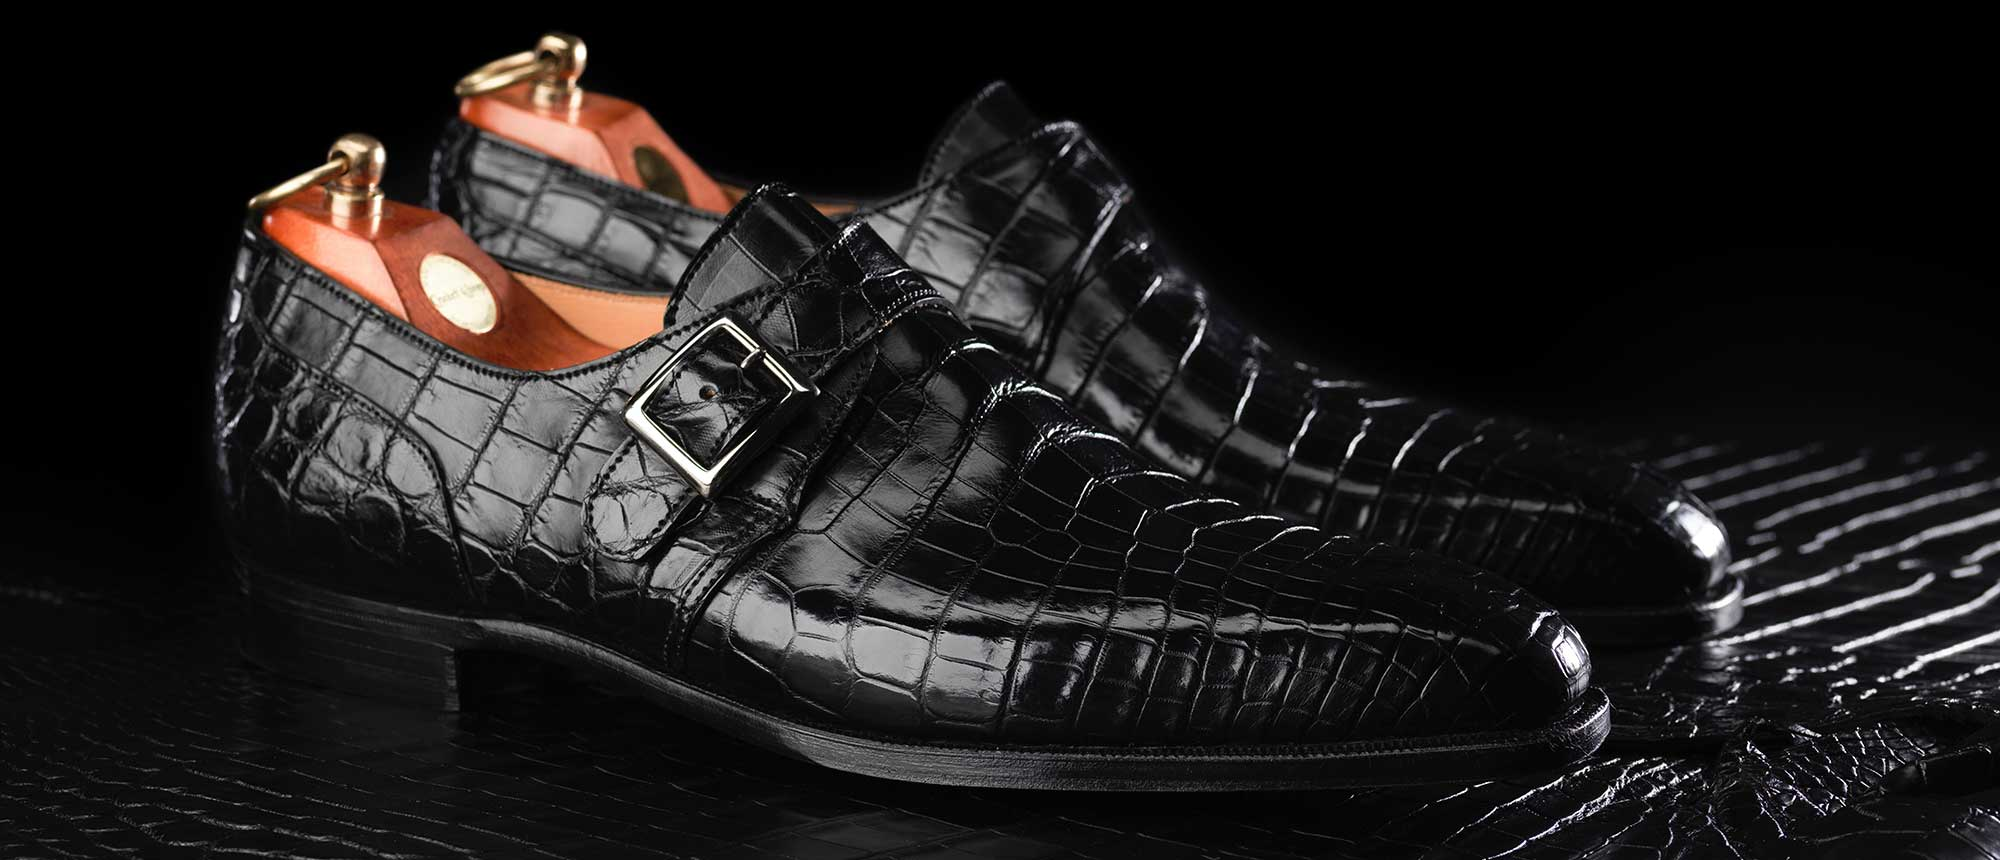 Crocodile leather Crockett & Jones